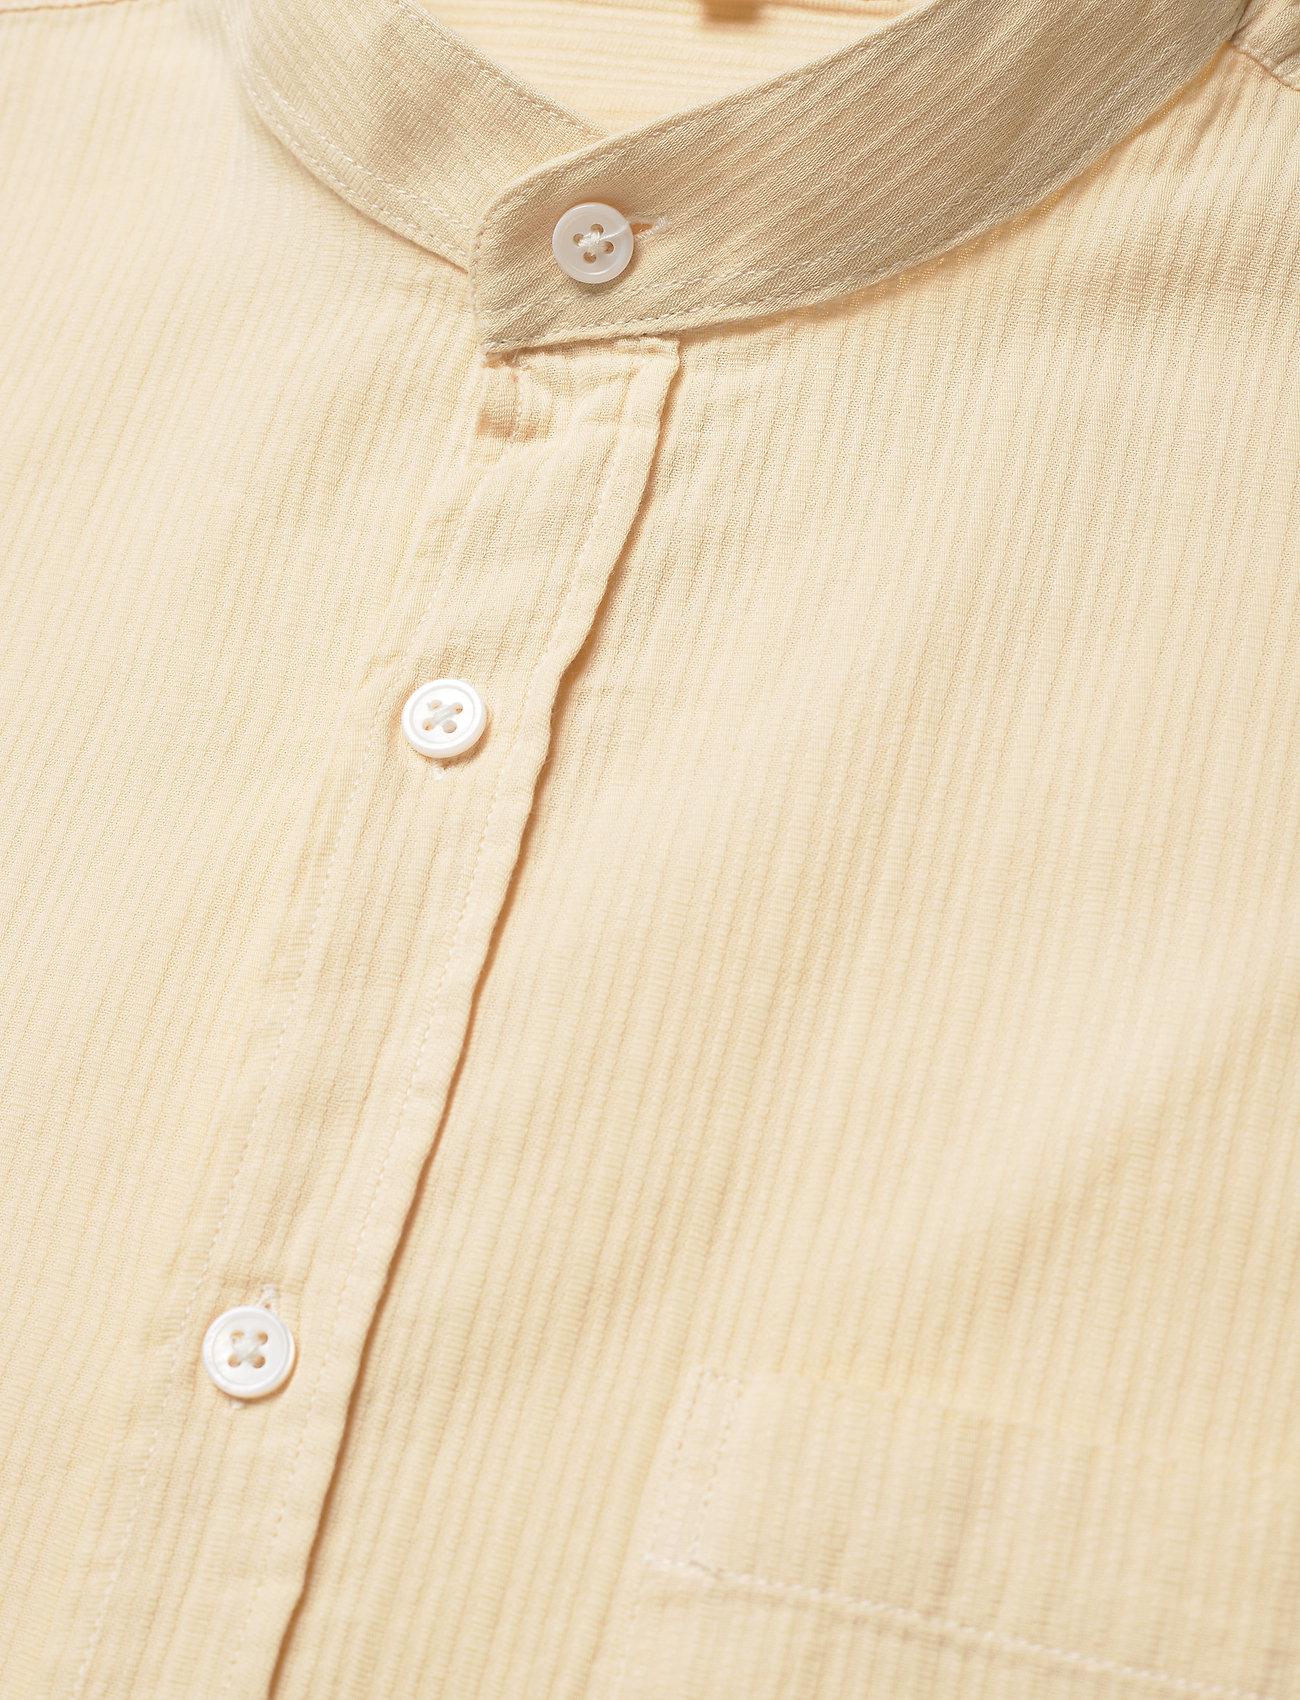 Far Afield - Twombly L/S Shirt - Textured Stripe - koszule lniane - lw - 3